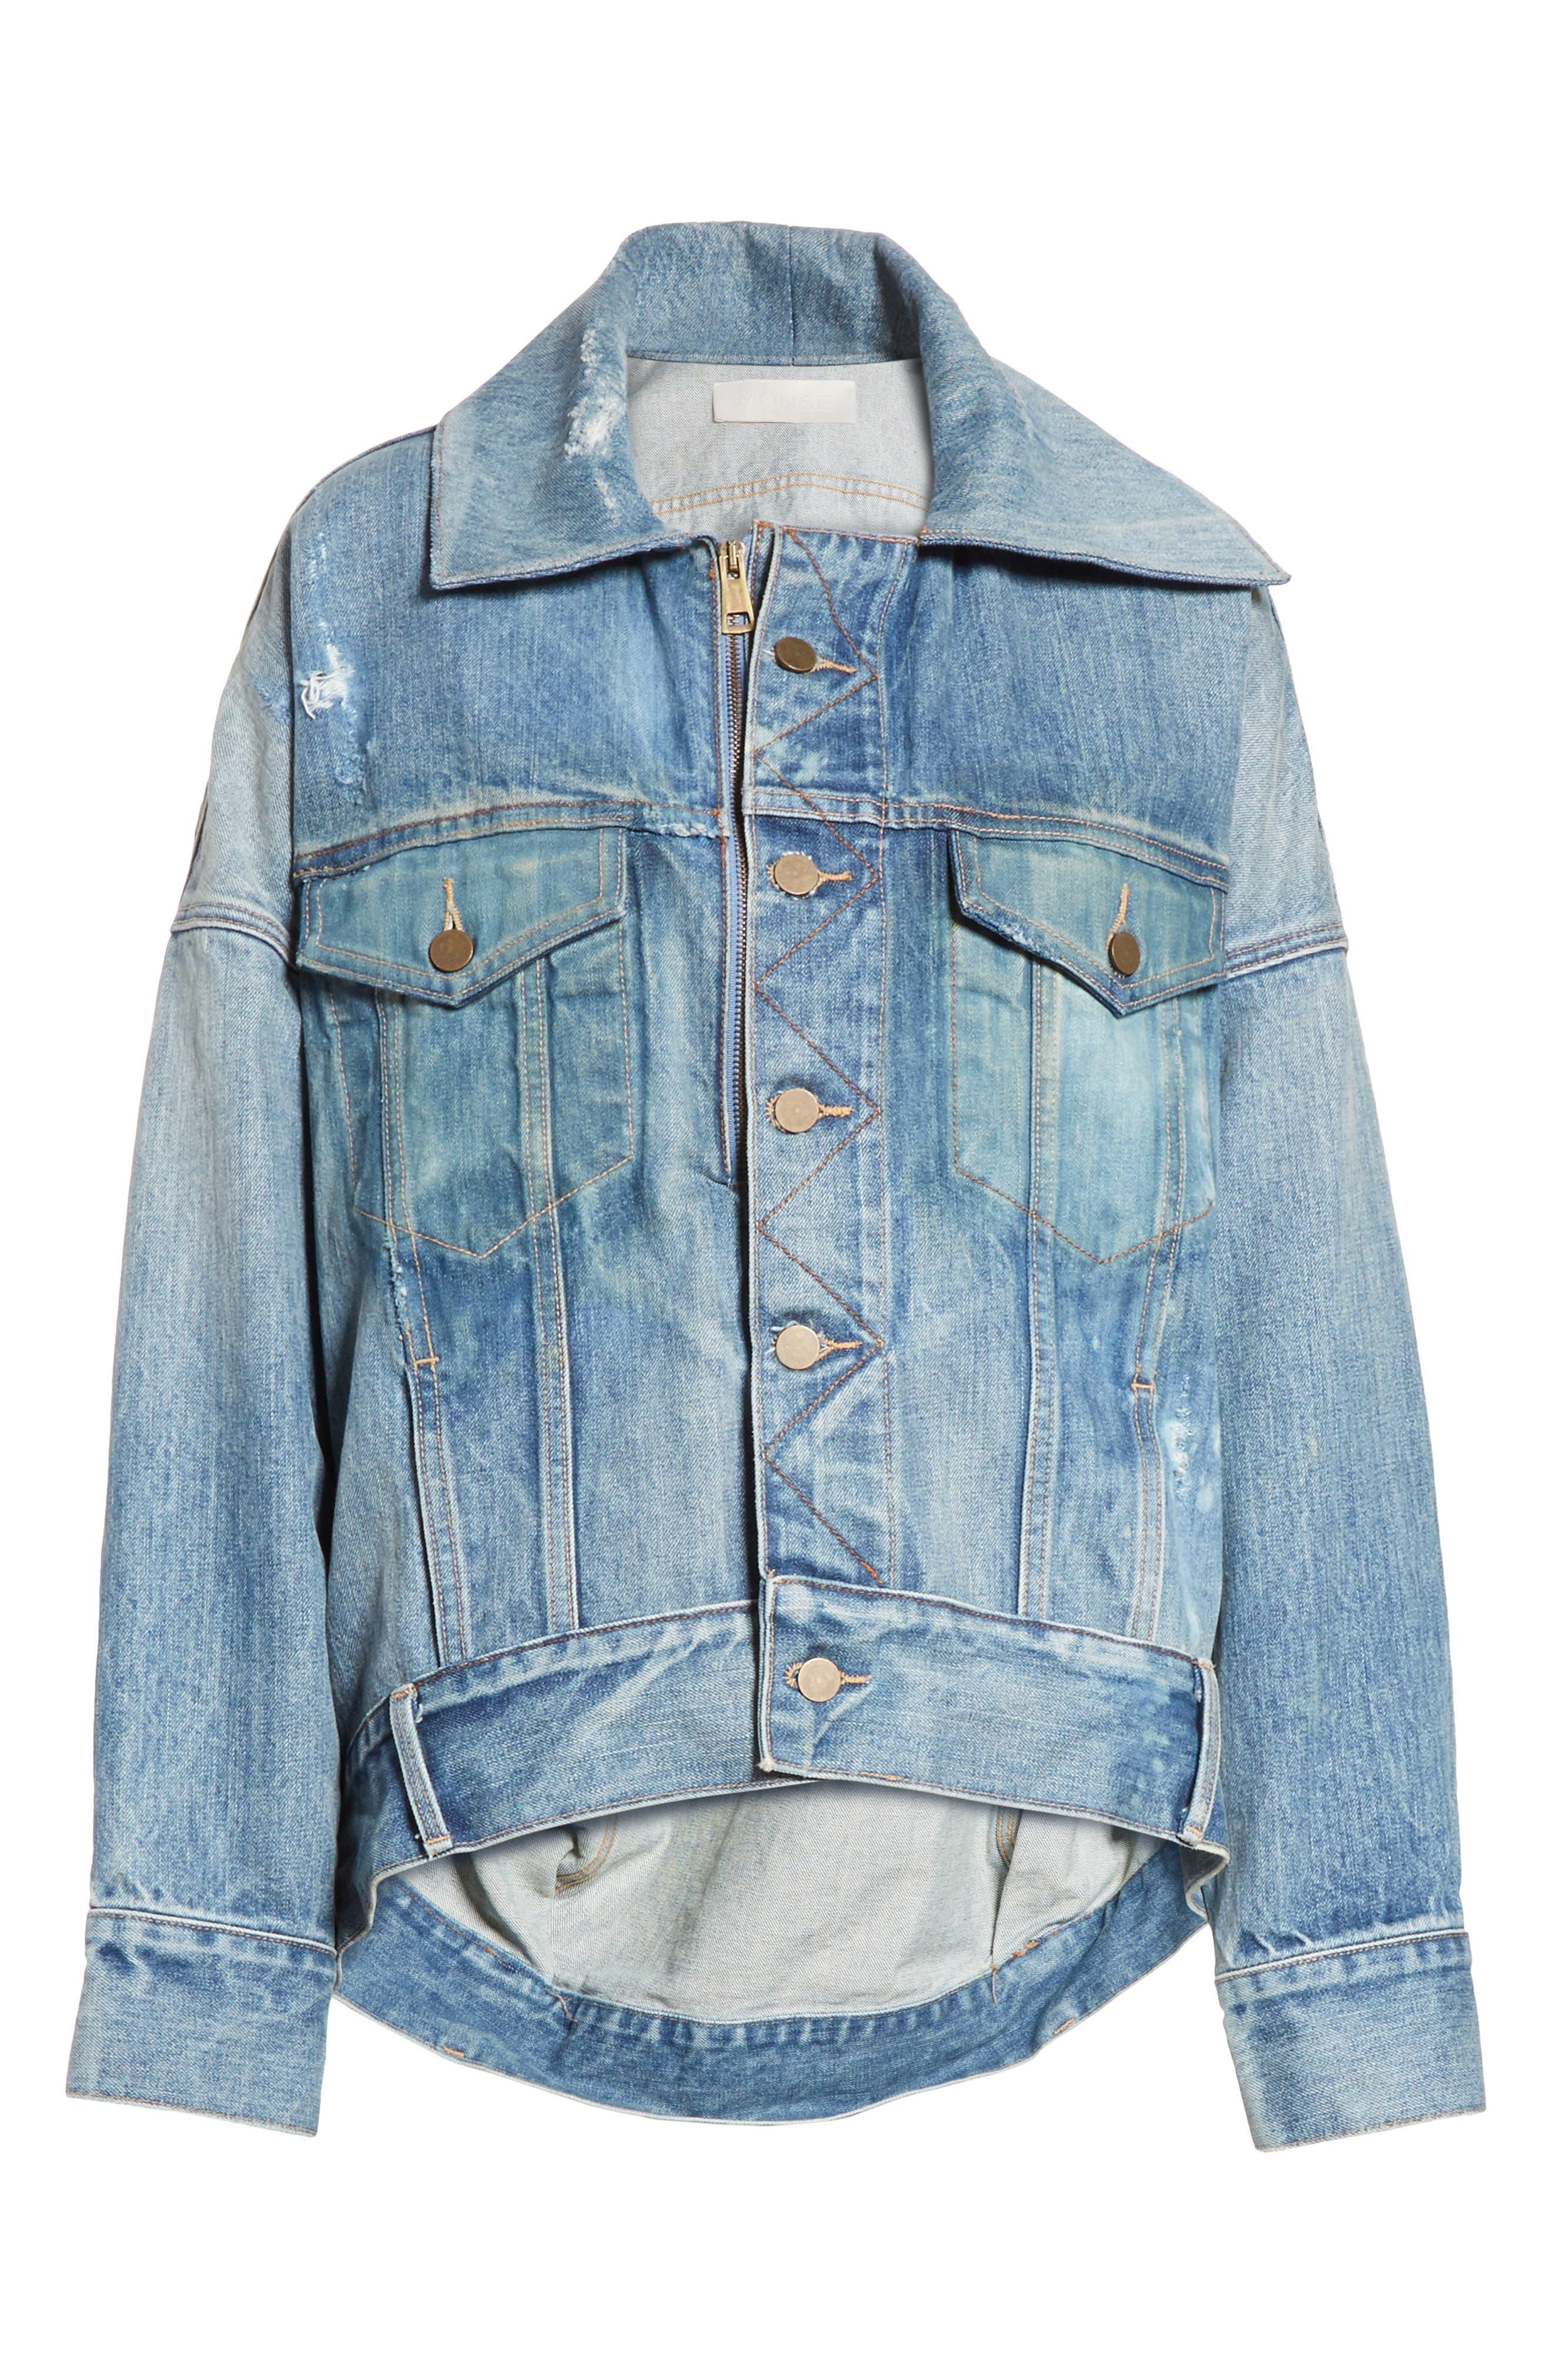 Cocoon Denim Jacket,                             Alternate thumbnail 8, color,                             Blue